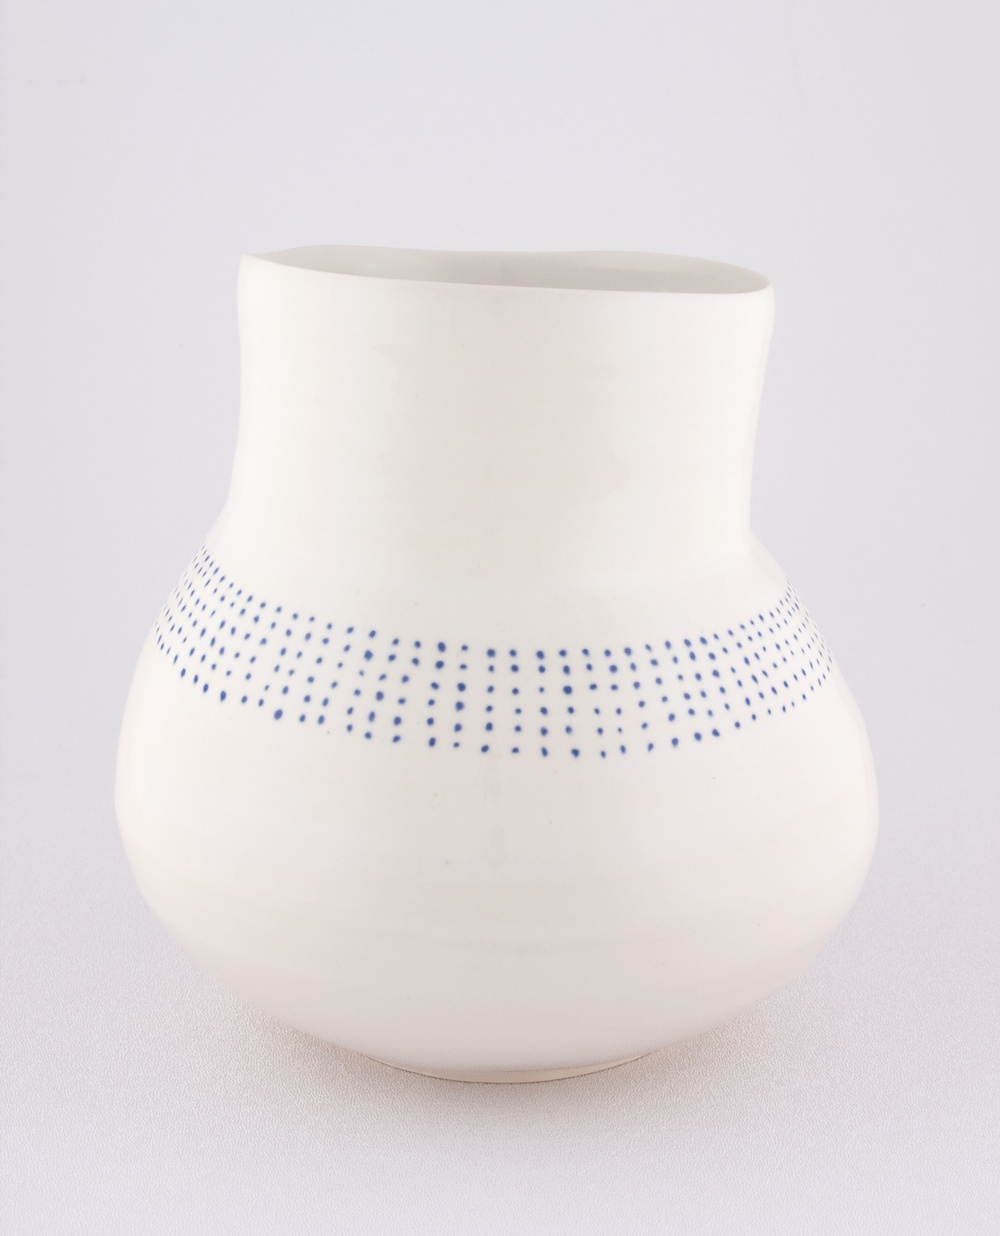 Shio Kusaka  Untitled (blue dot stripe 1)  2009 Porcelain 7 ½h x 7w in SK051